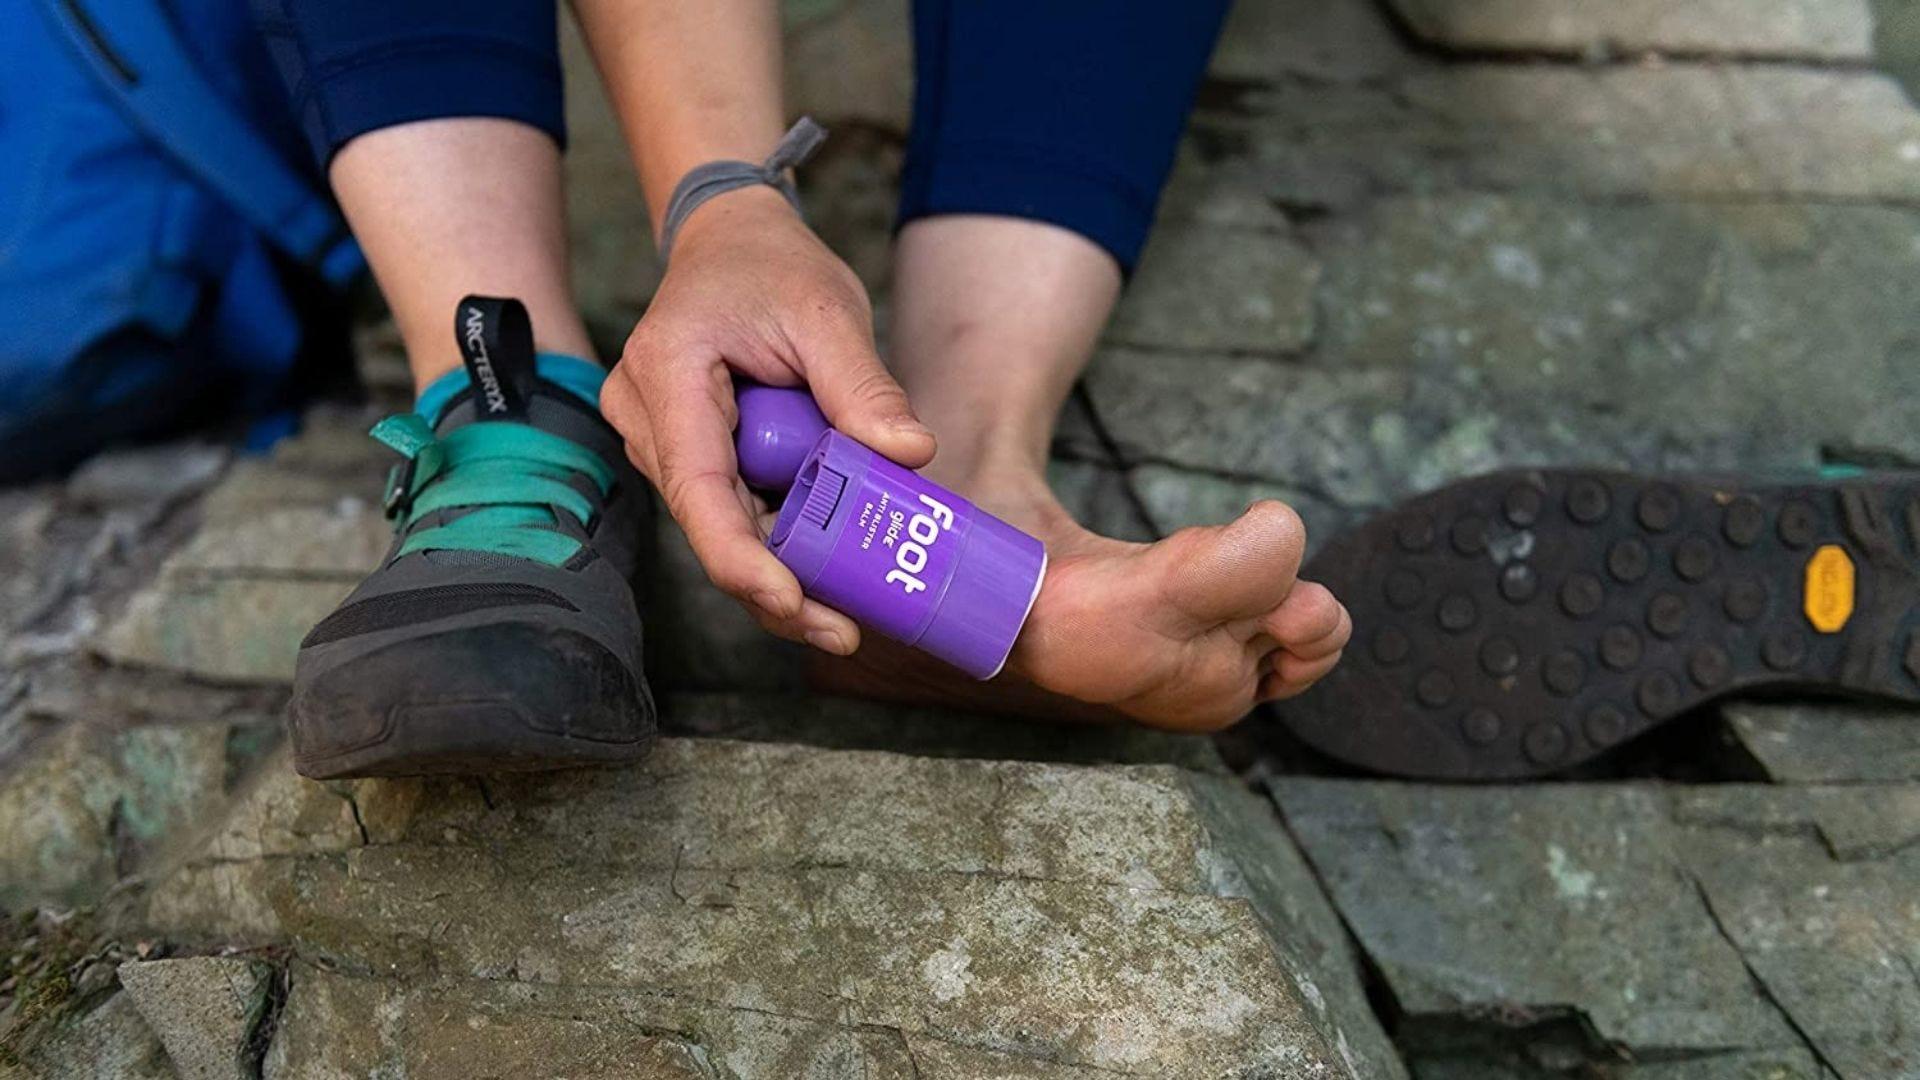 Someone rubs a purple balm stick onto their foot